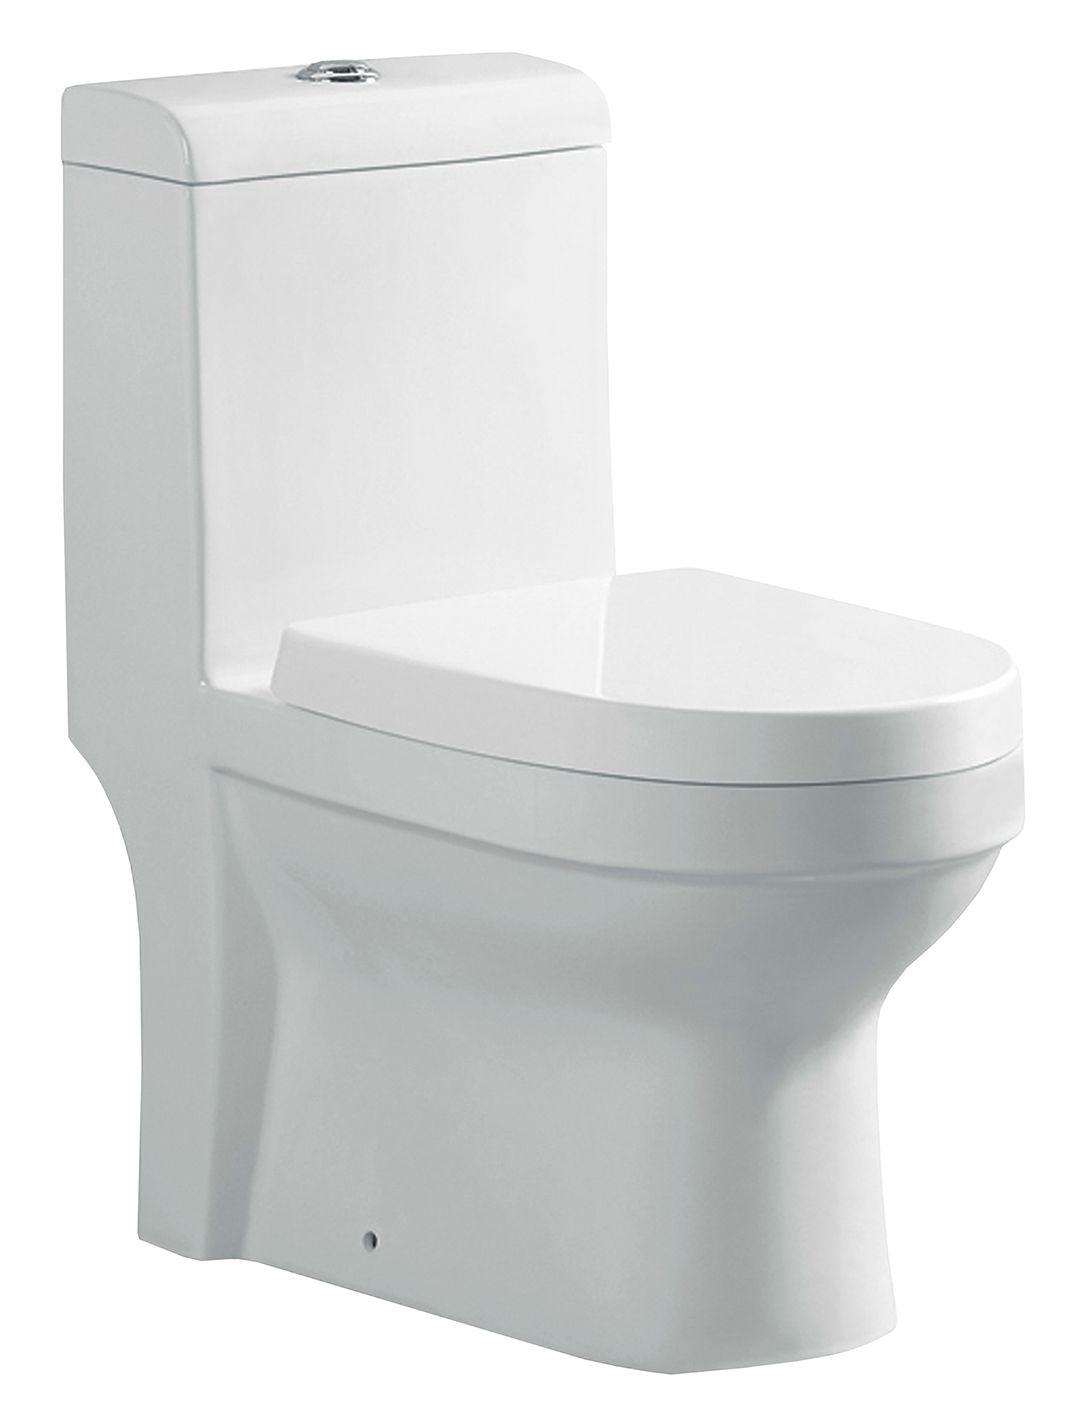 Vaso Sanitário Caixa Acoplada Reno R 300